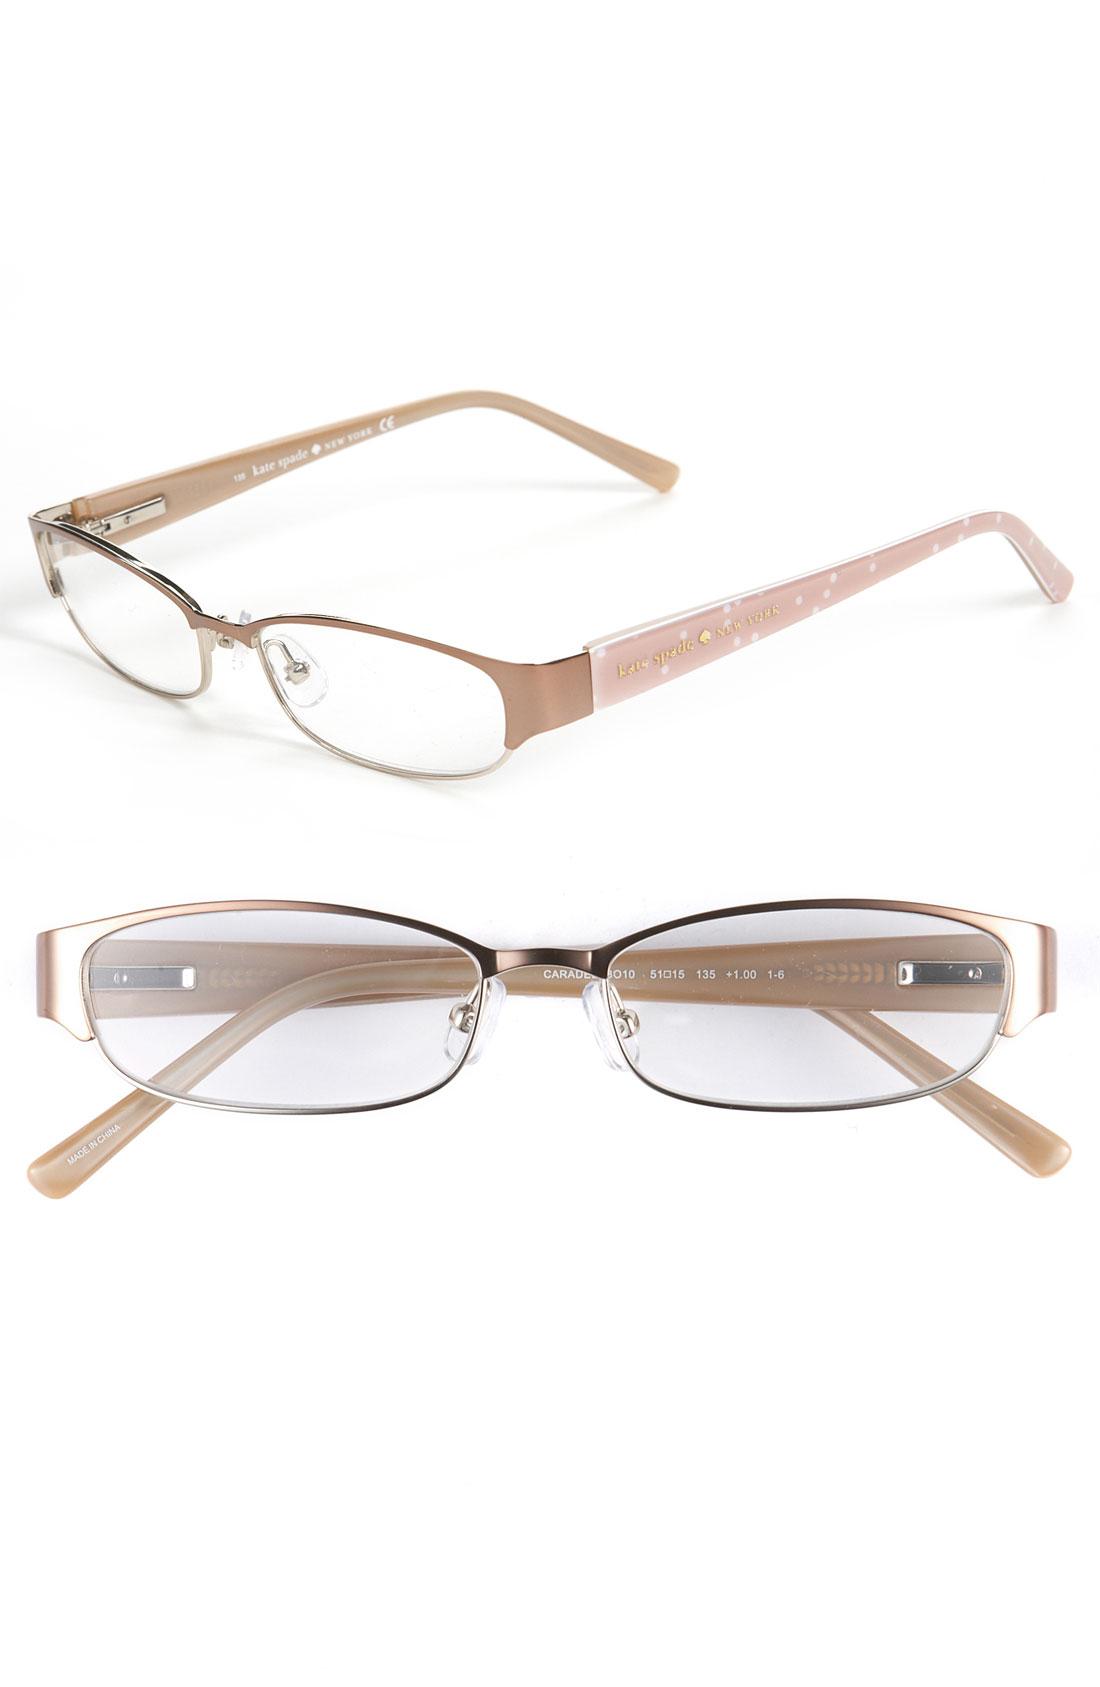 Kate Spade Eyeglass Frames 2012 : Kate Spade Caradee Reading Glasses in Beige (brown/ gold ...